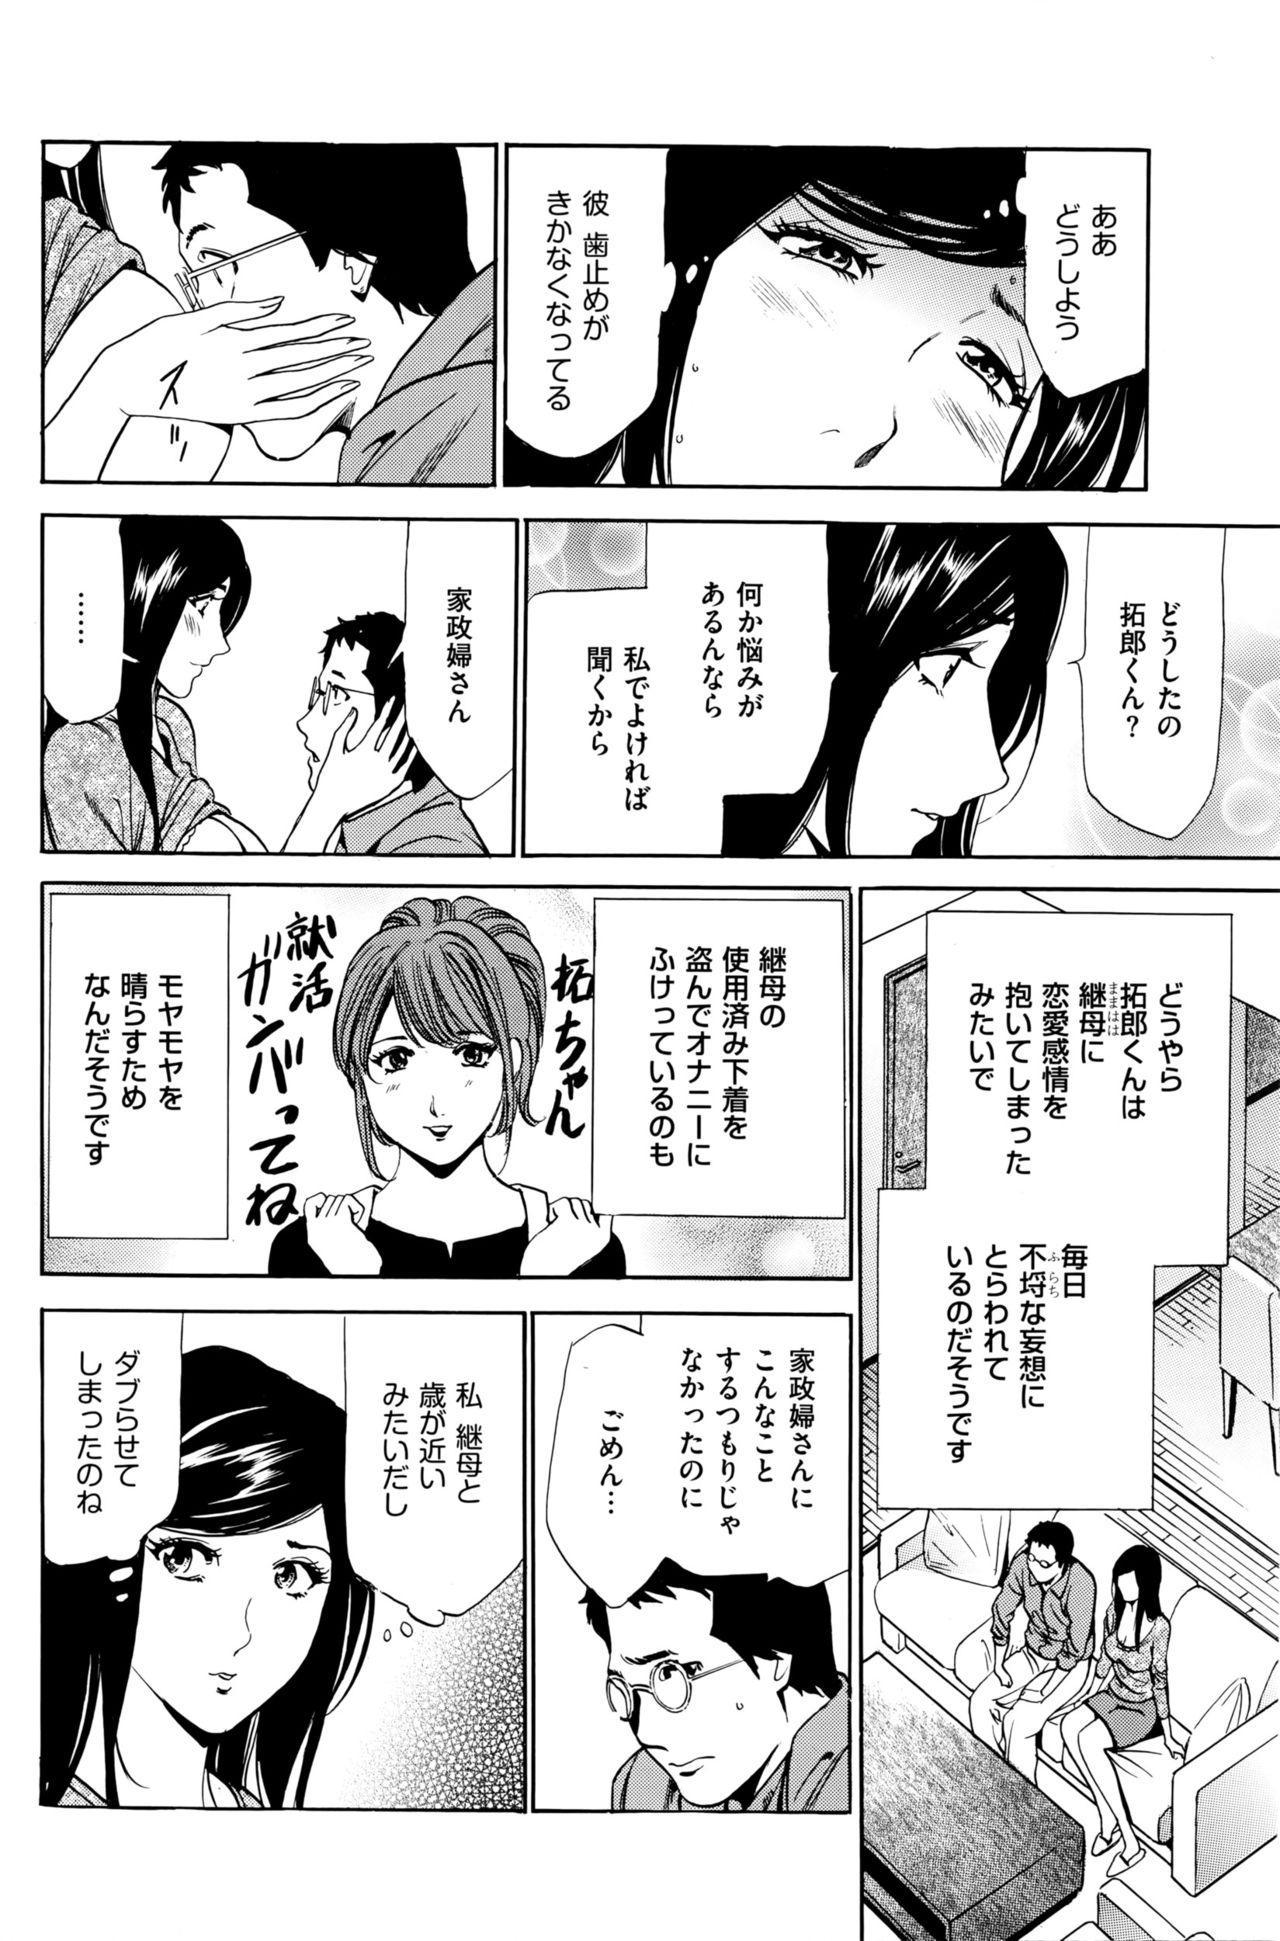 Wa Usuki Ipa a 1-10 26